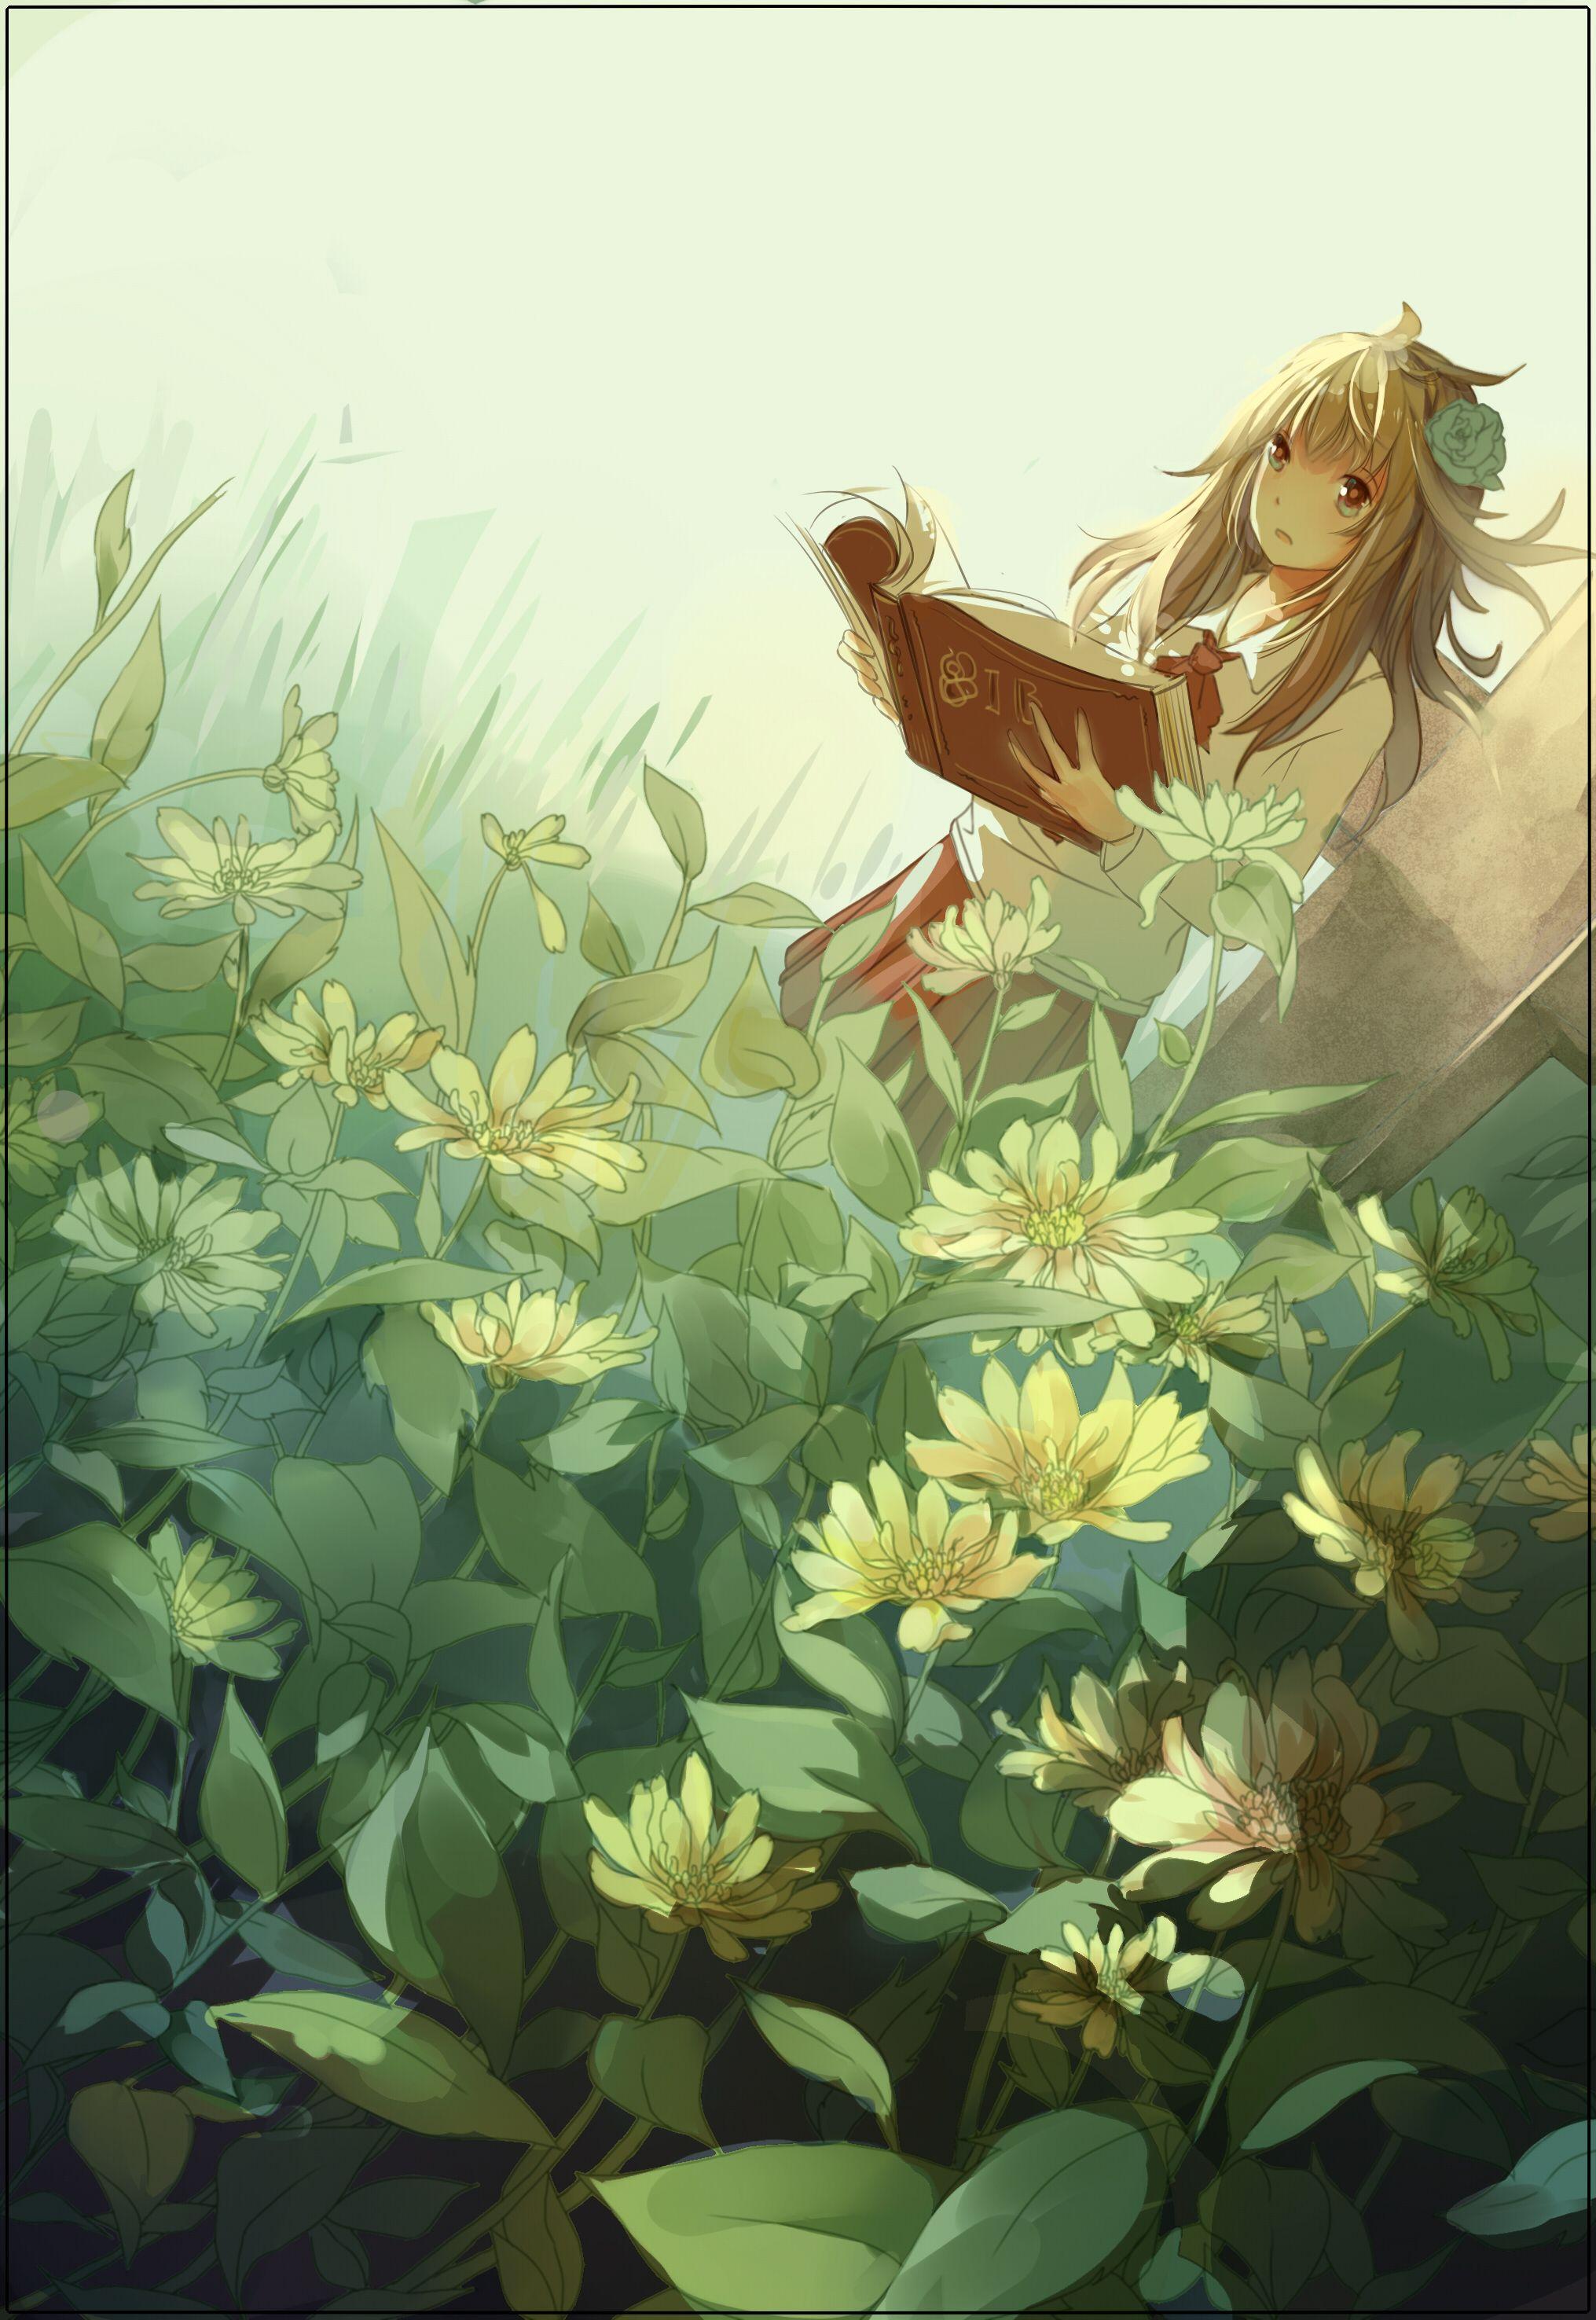 eg Cool Looking Manga Pinterest